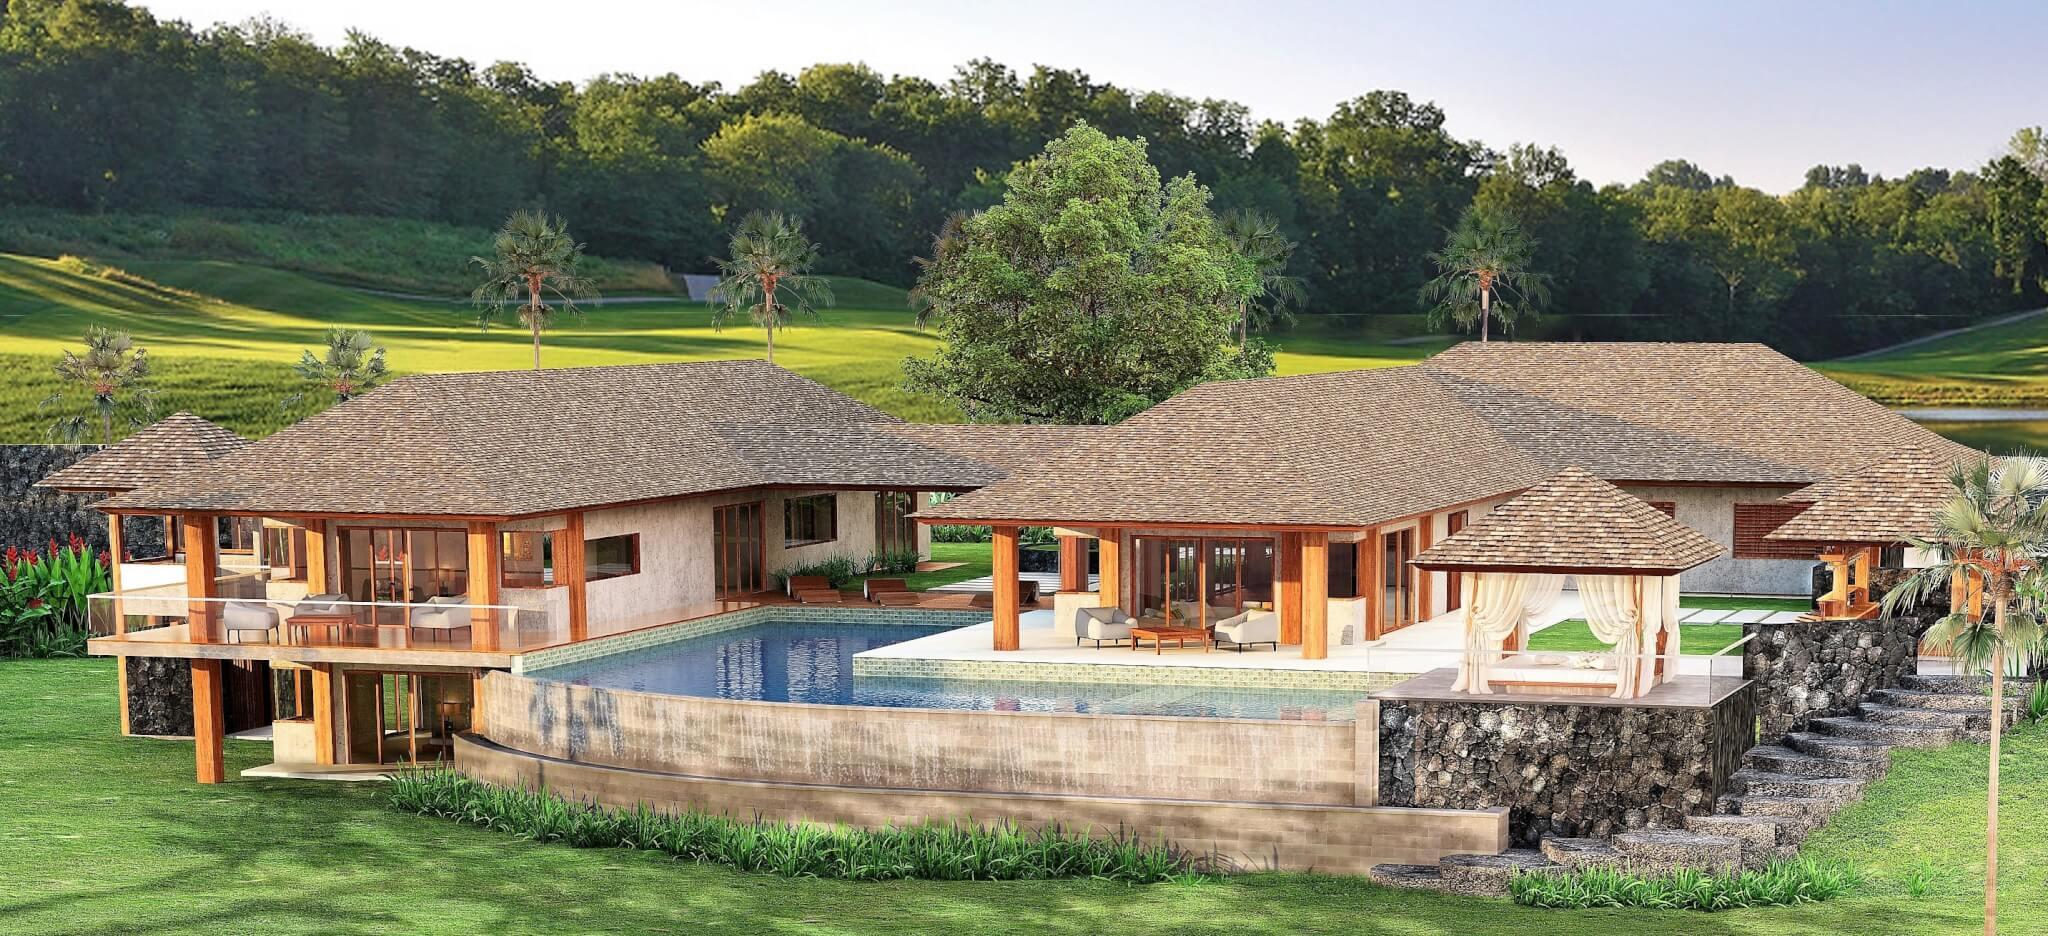 Best Architects on Kauai - TAG